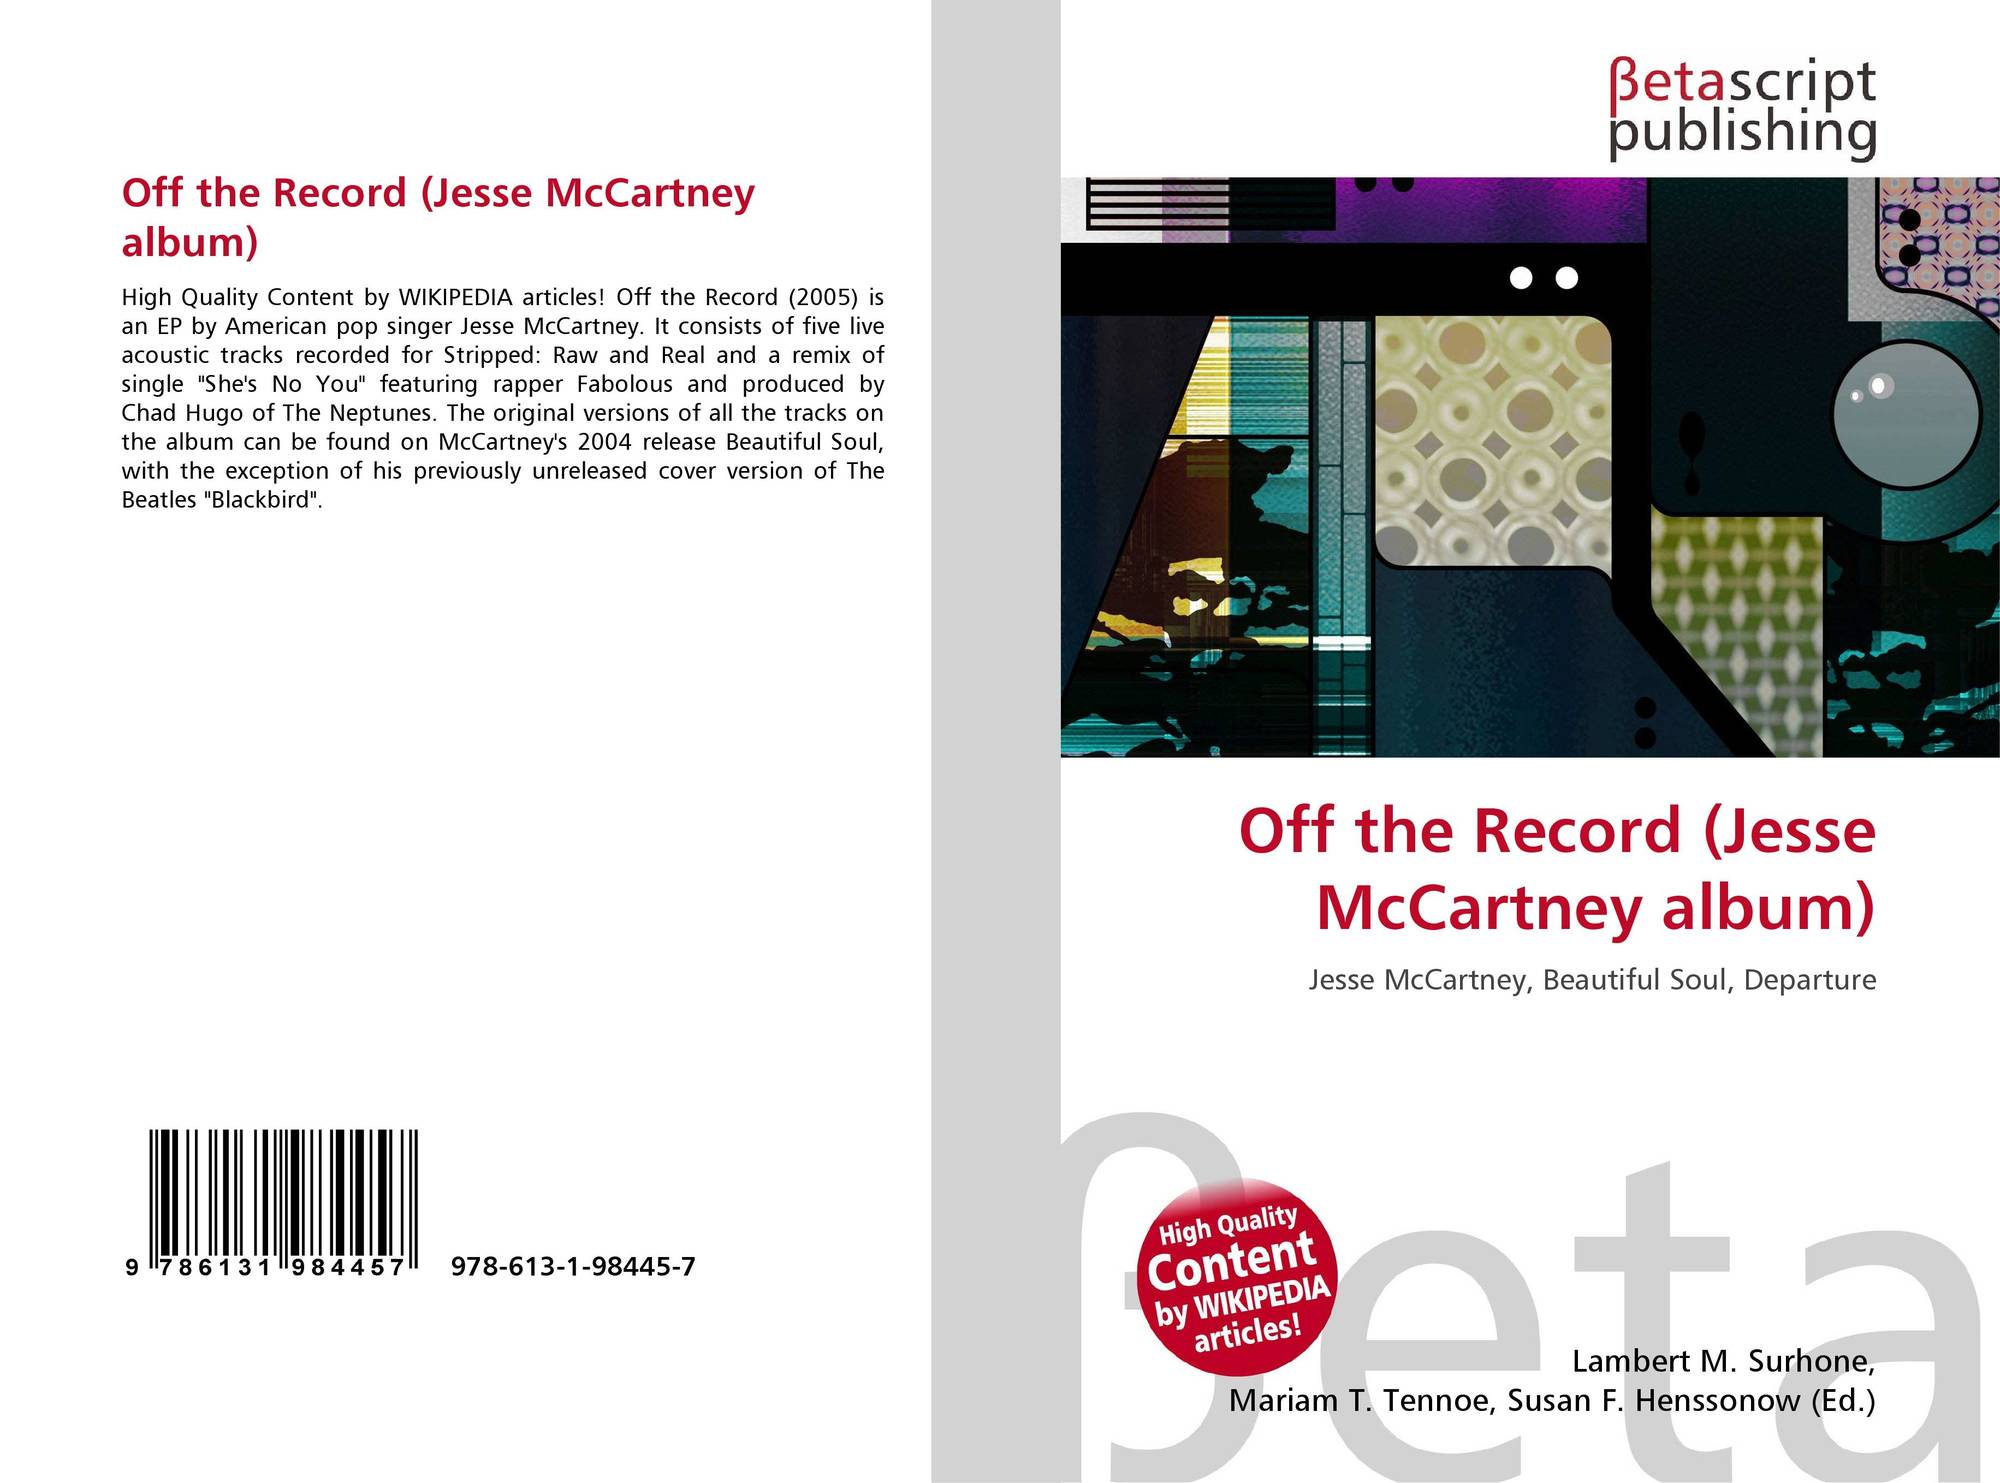 jesse mccartney discography wiki